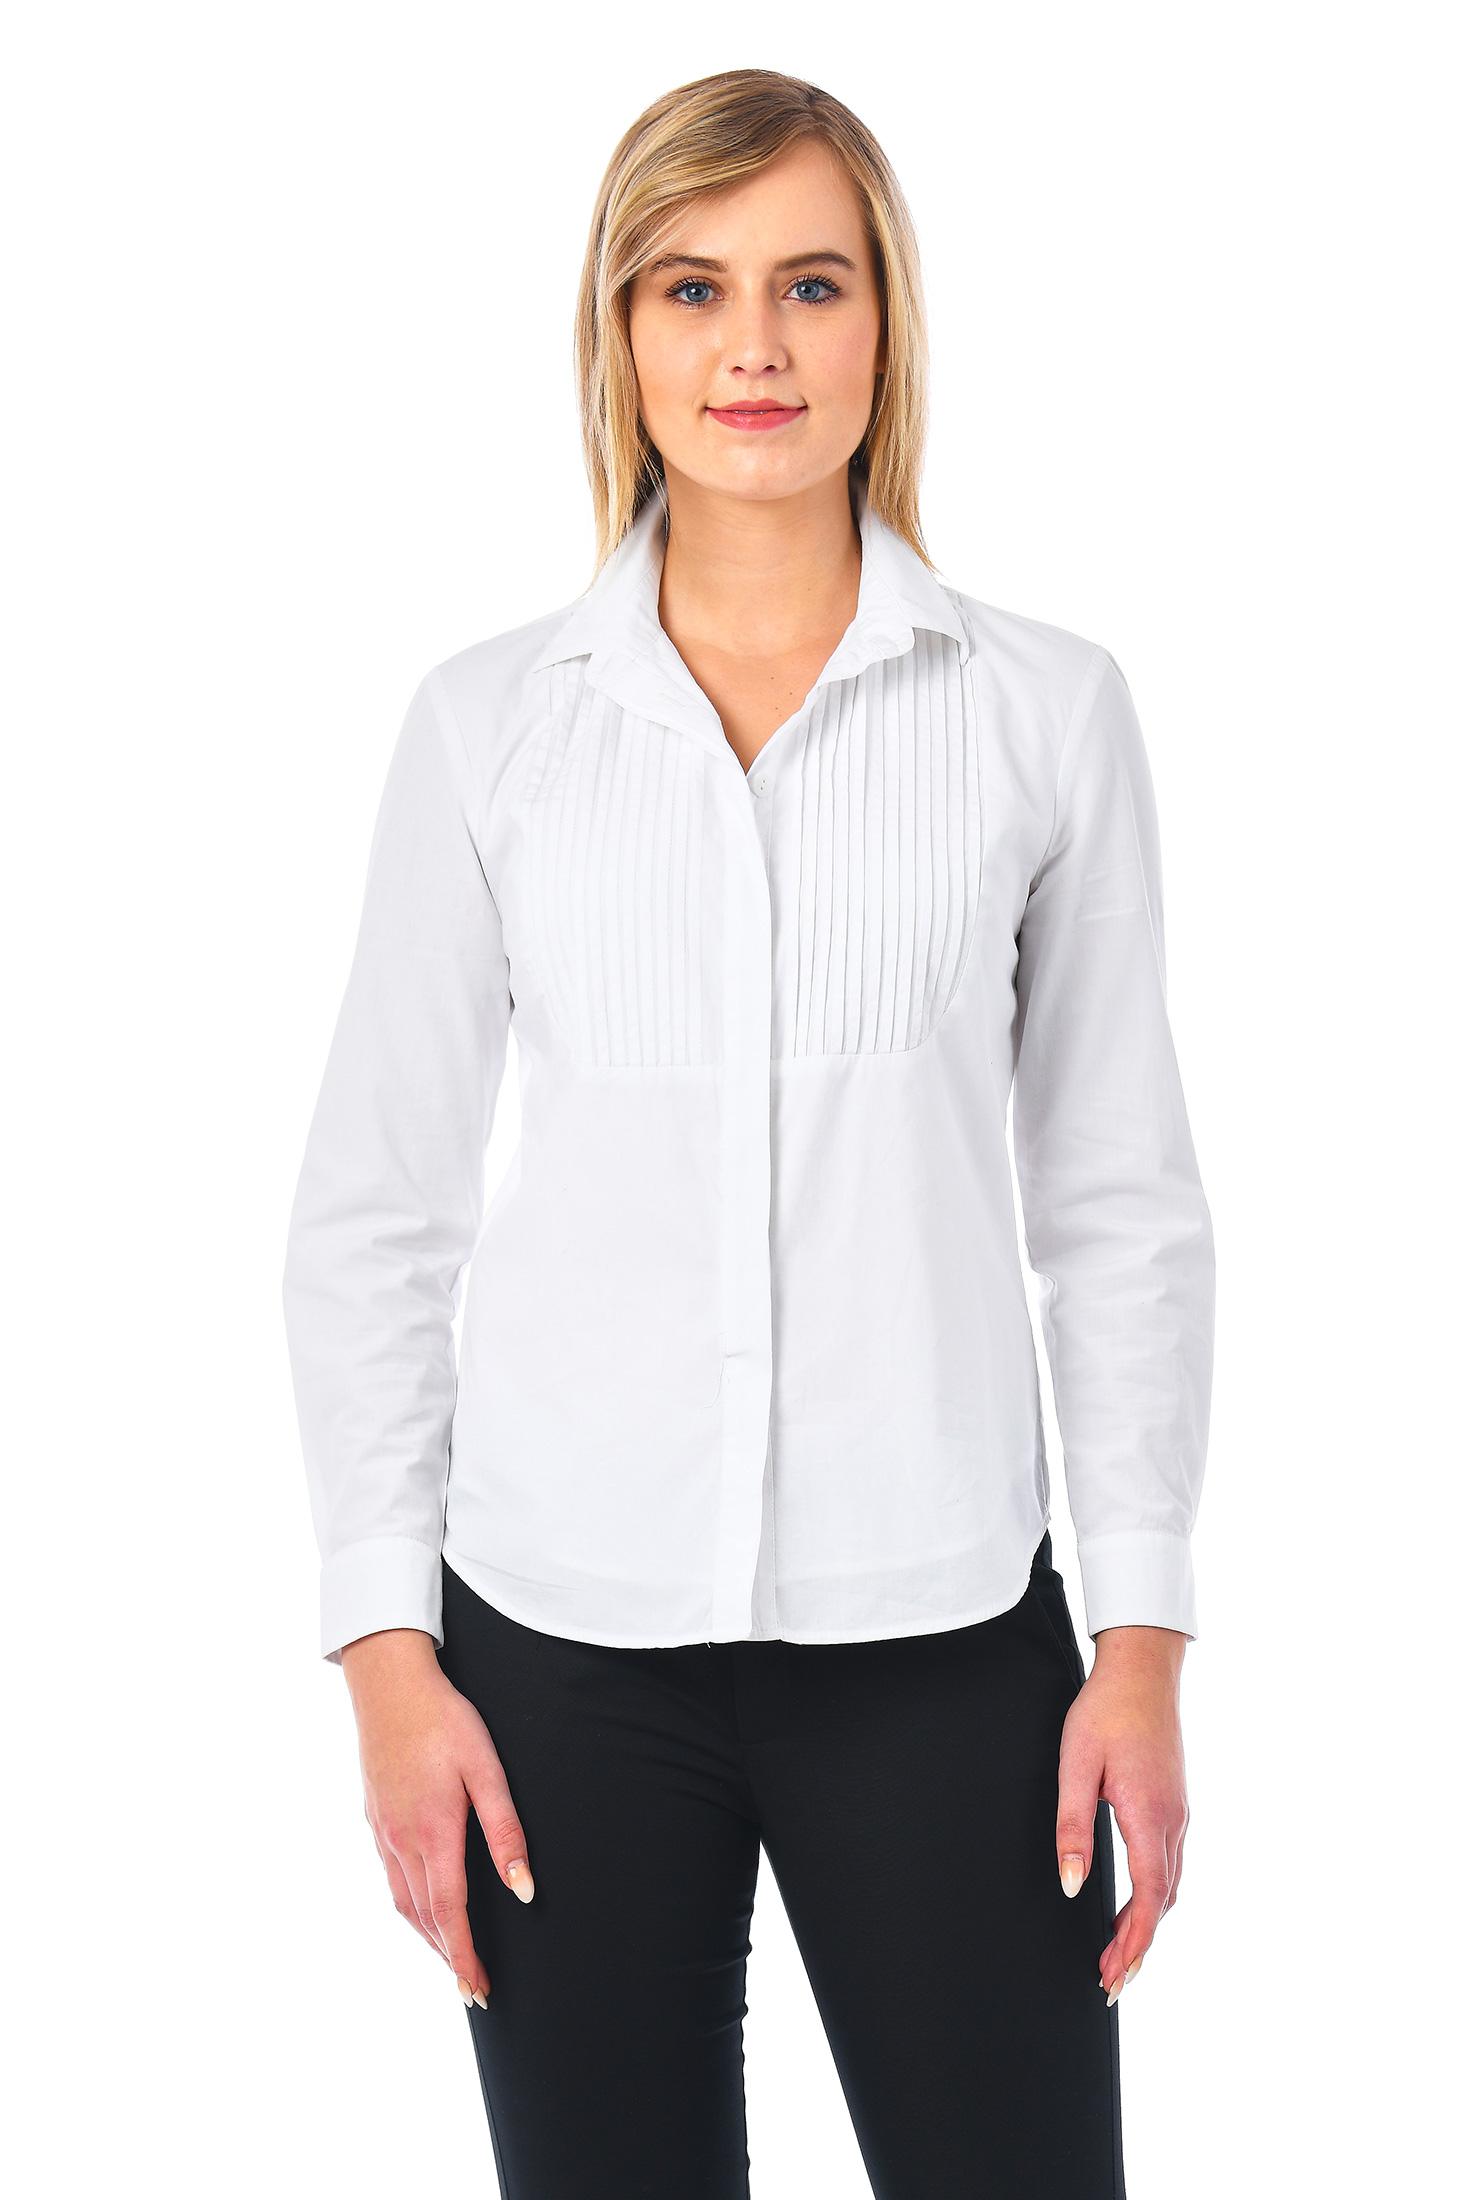 eShakti Women's Pleat bib front cotton poplin slim fit button-up shirt CL0049864